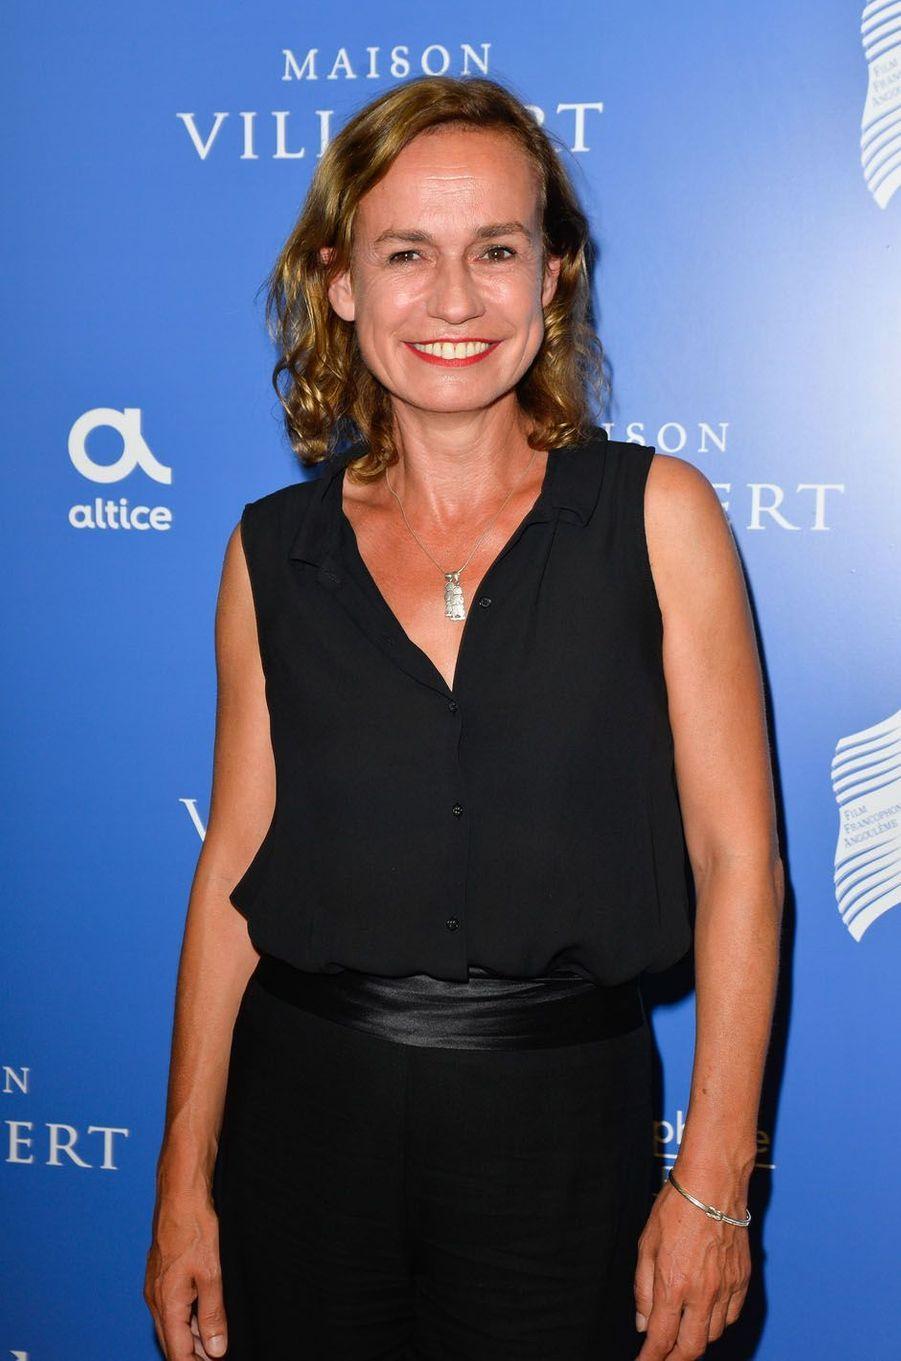 Sandrine Bonnaireau festival du film francophone d'Angoulême, le 27 août 2017.